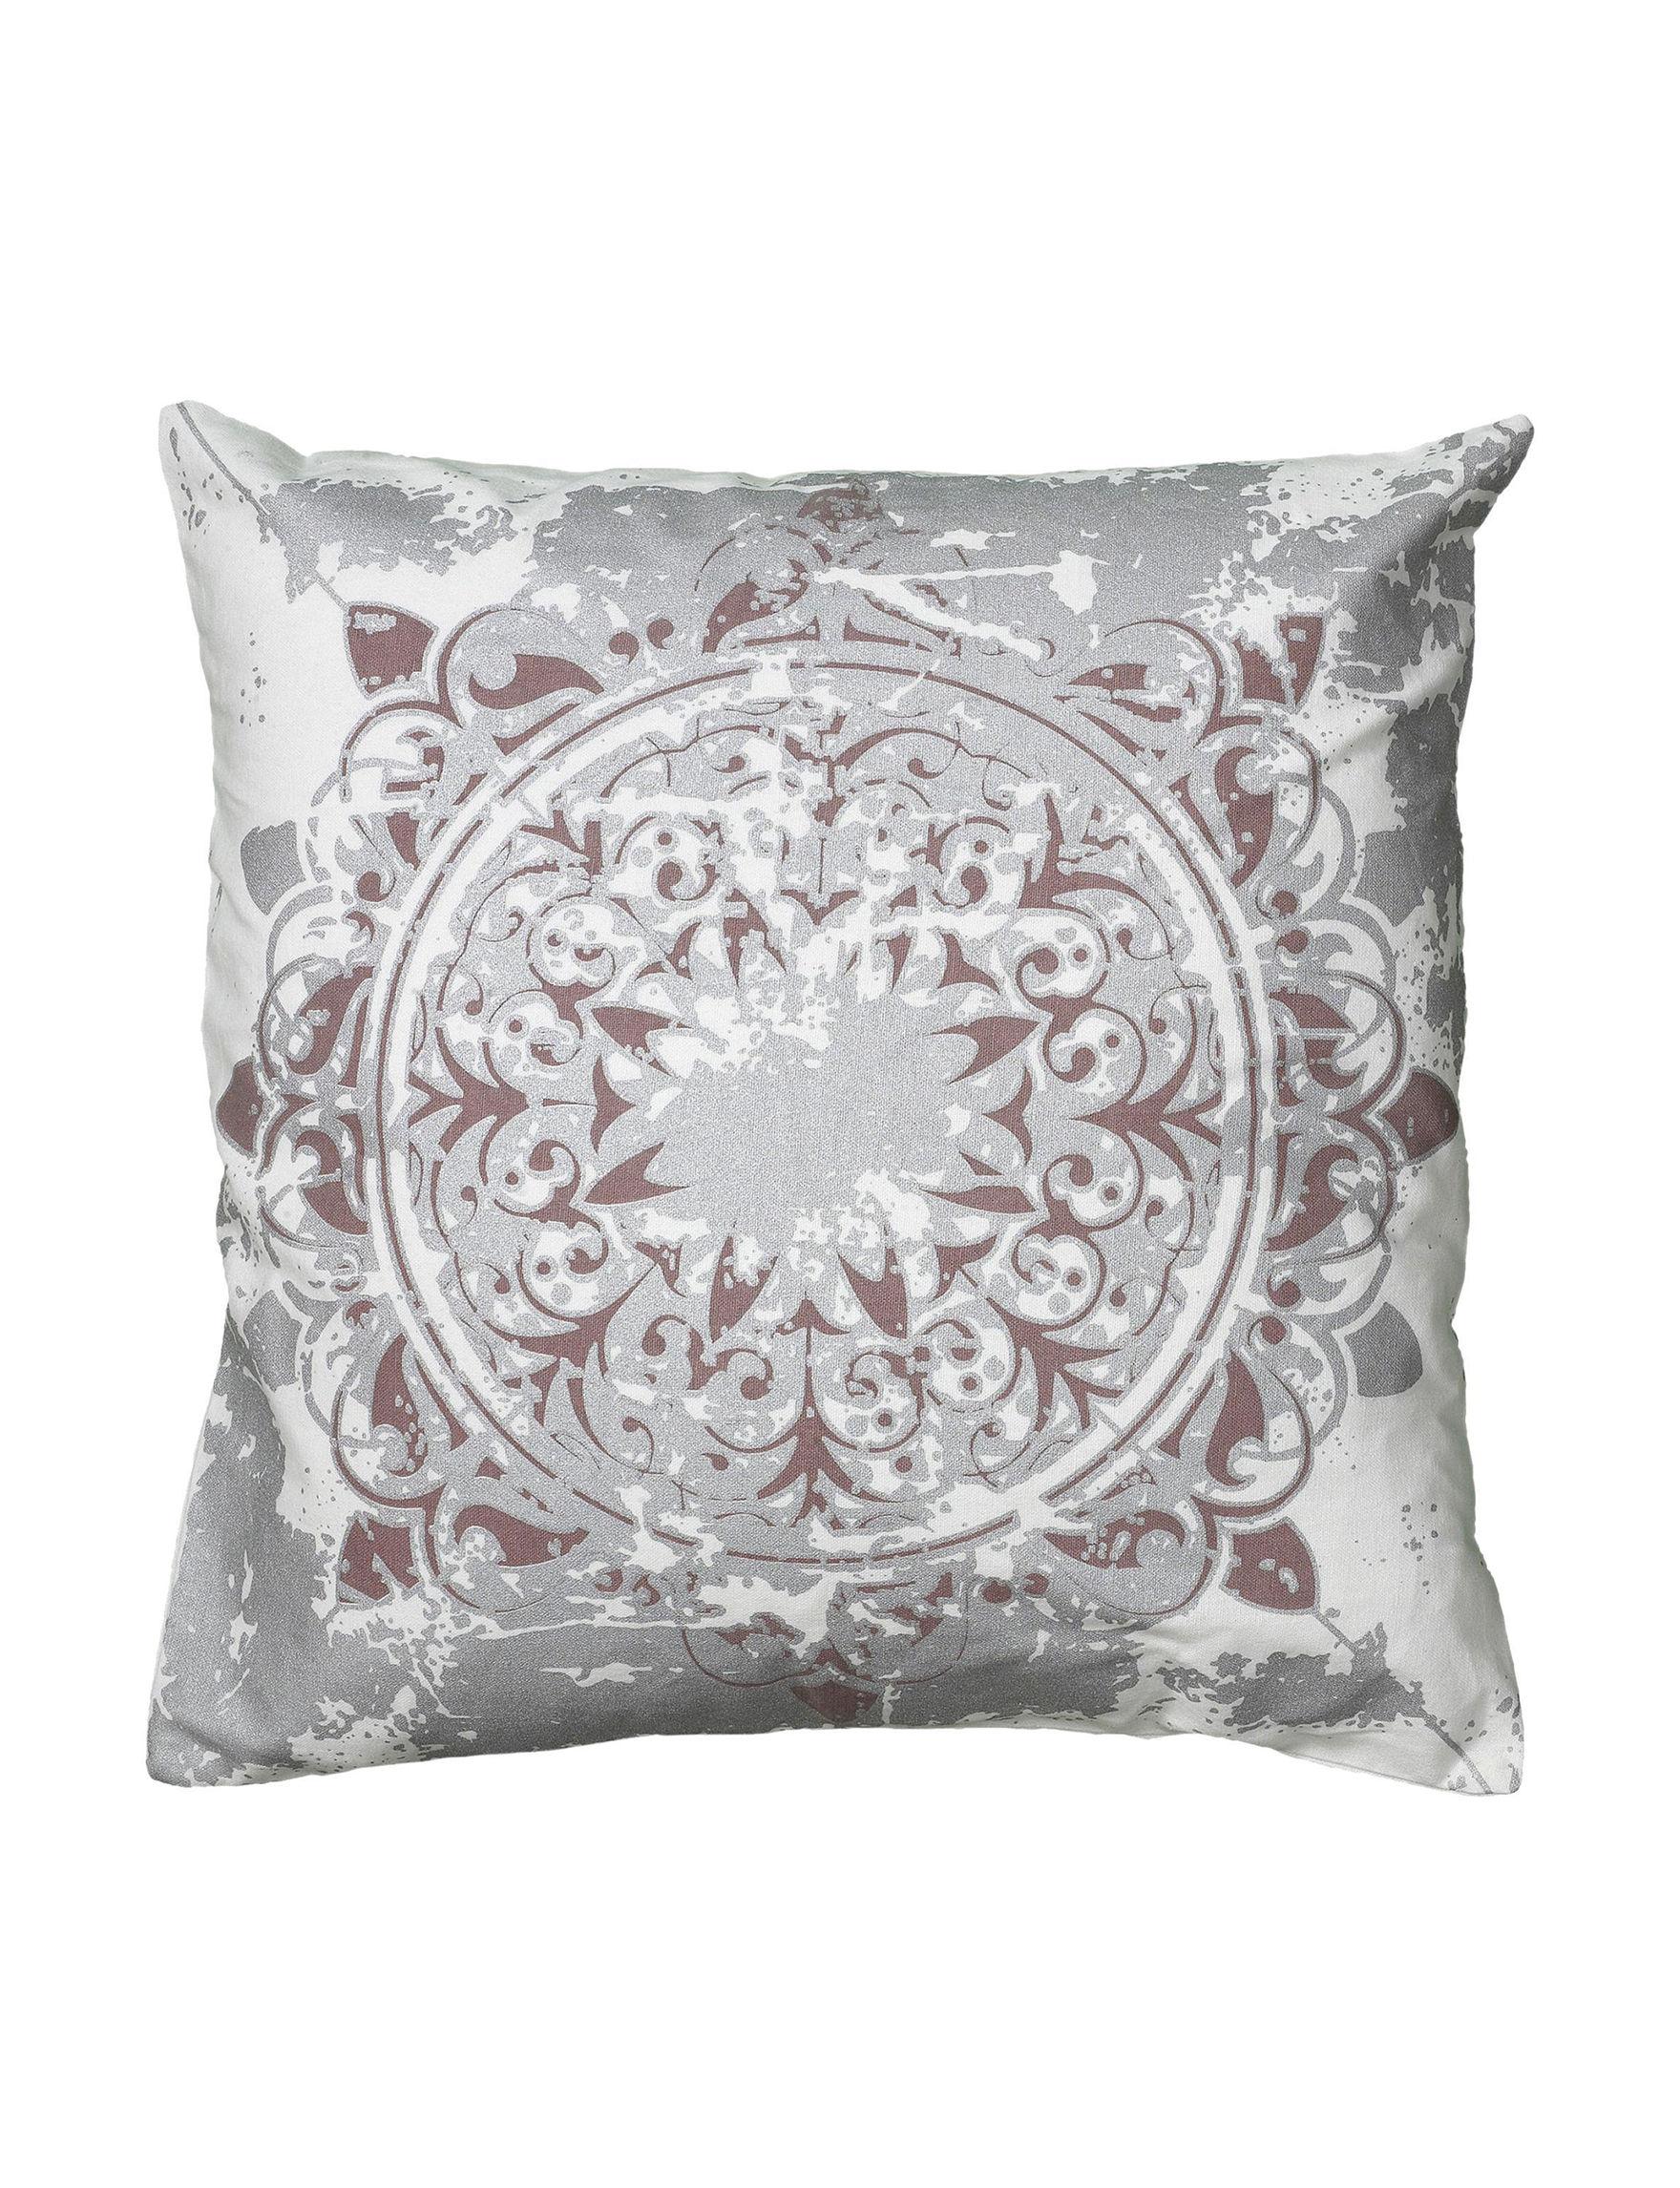 Rizzy Home White Decorative Pillows